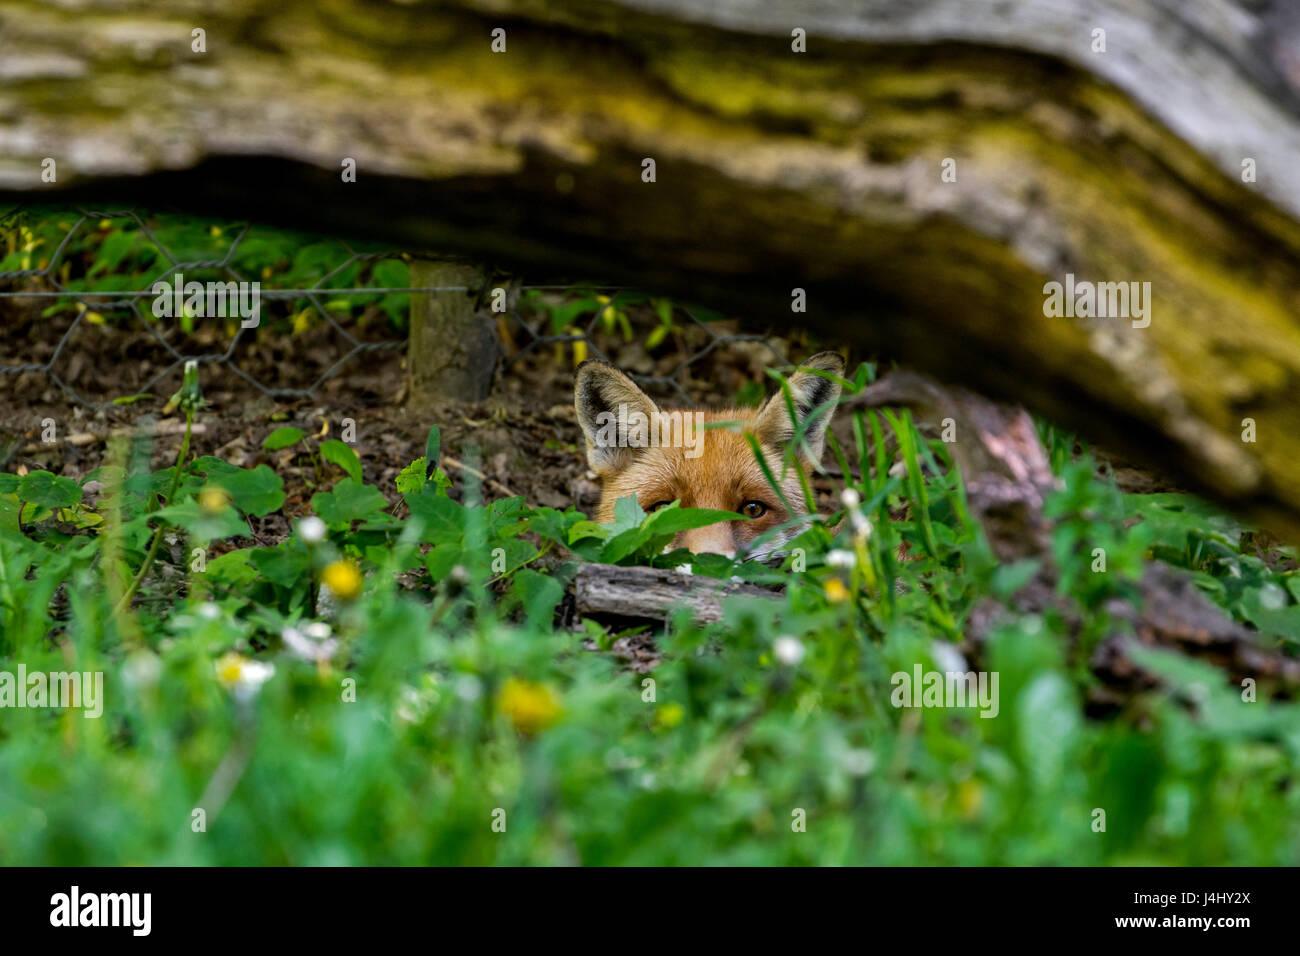 hunting-red-fox-vulpes-vulpes-digging-un